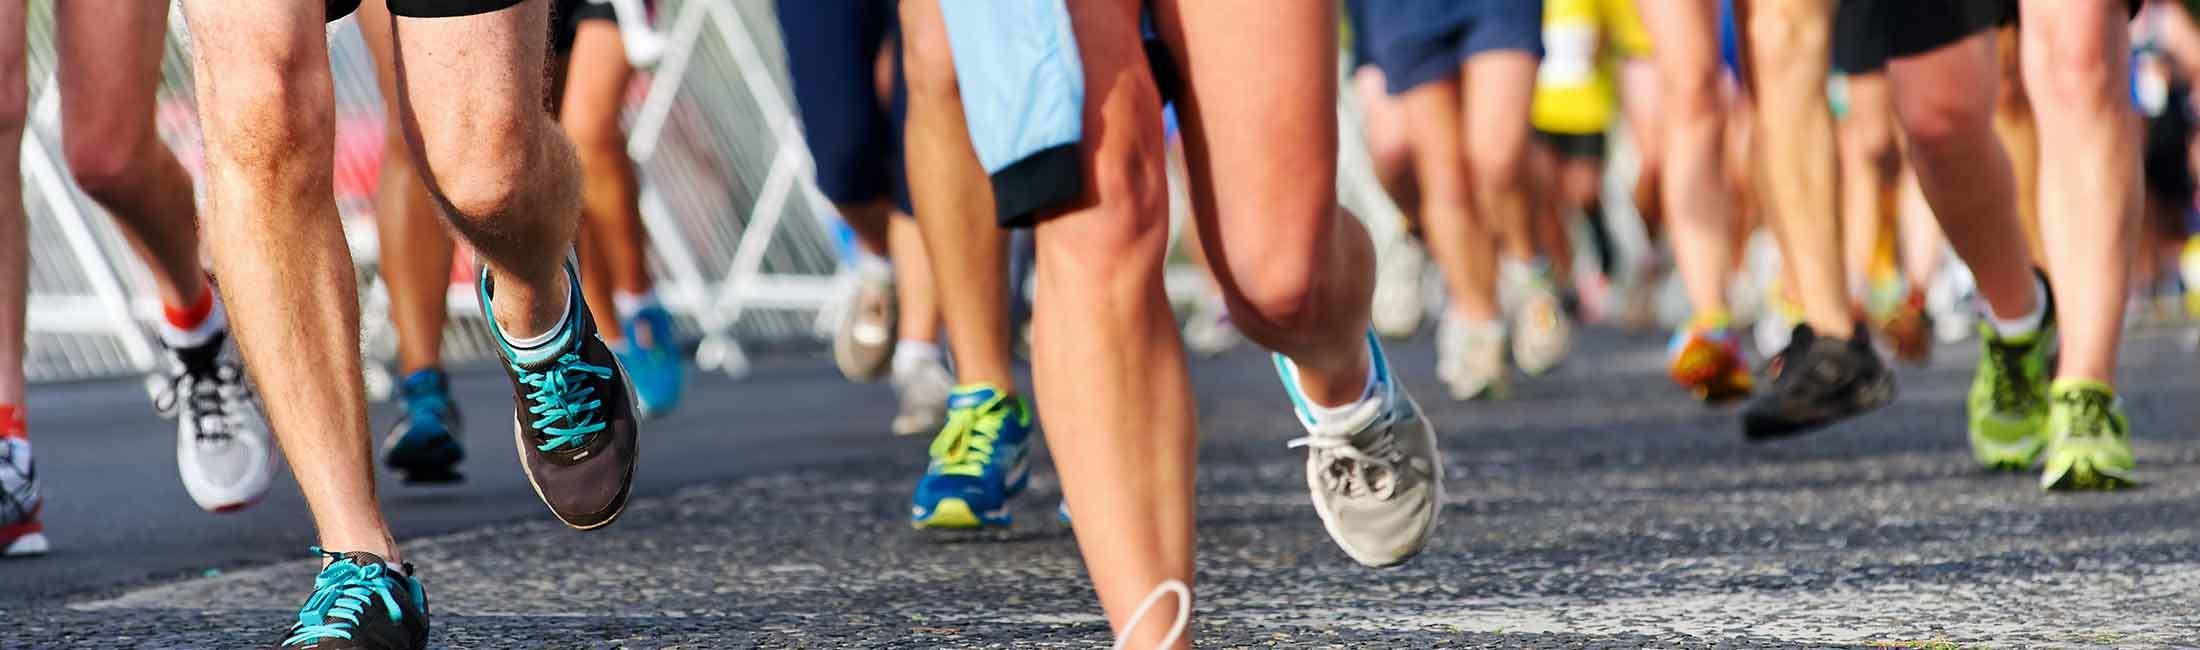 Marathon-1.jpg